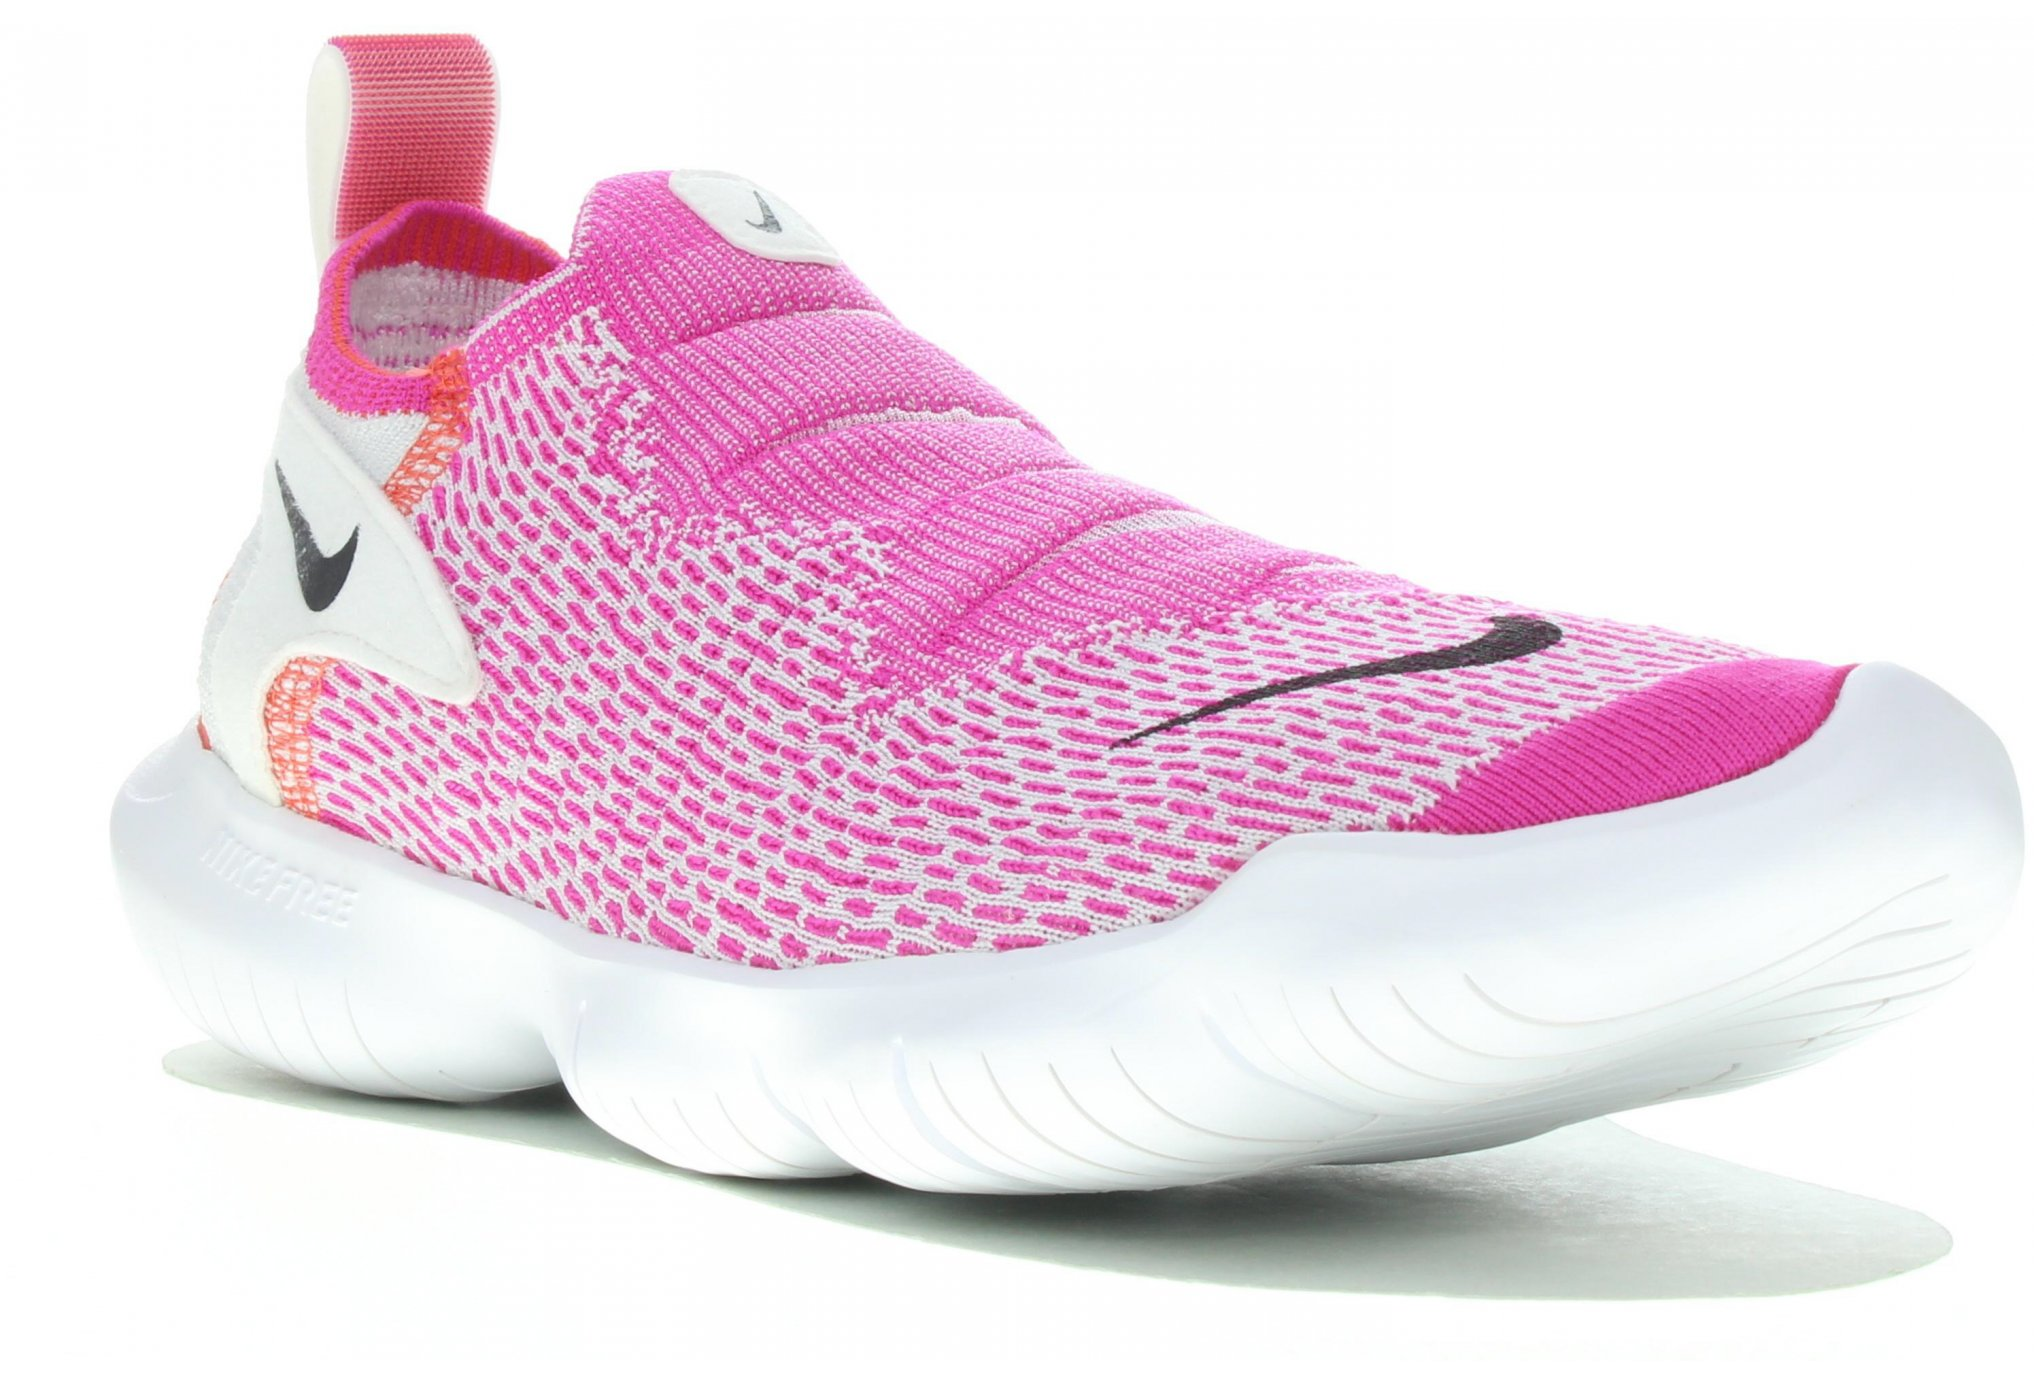 Nike Free RN Flyknit 3.0 2020 W Diététique Chaussures femme